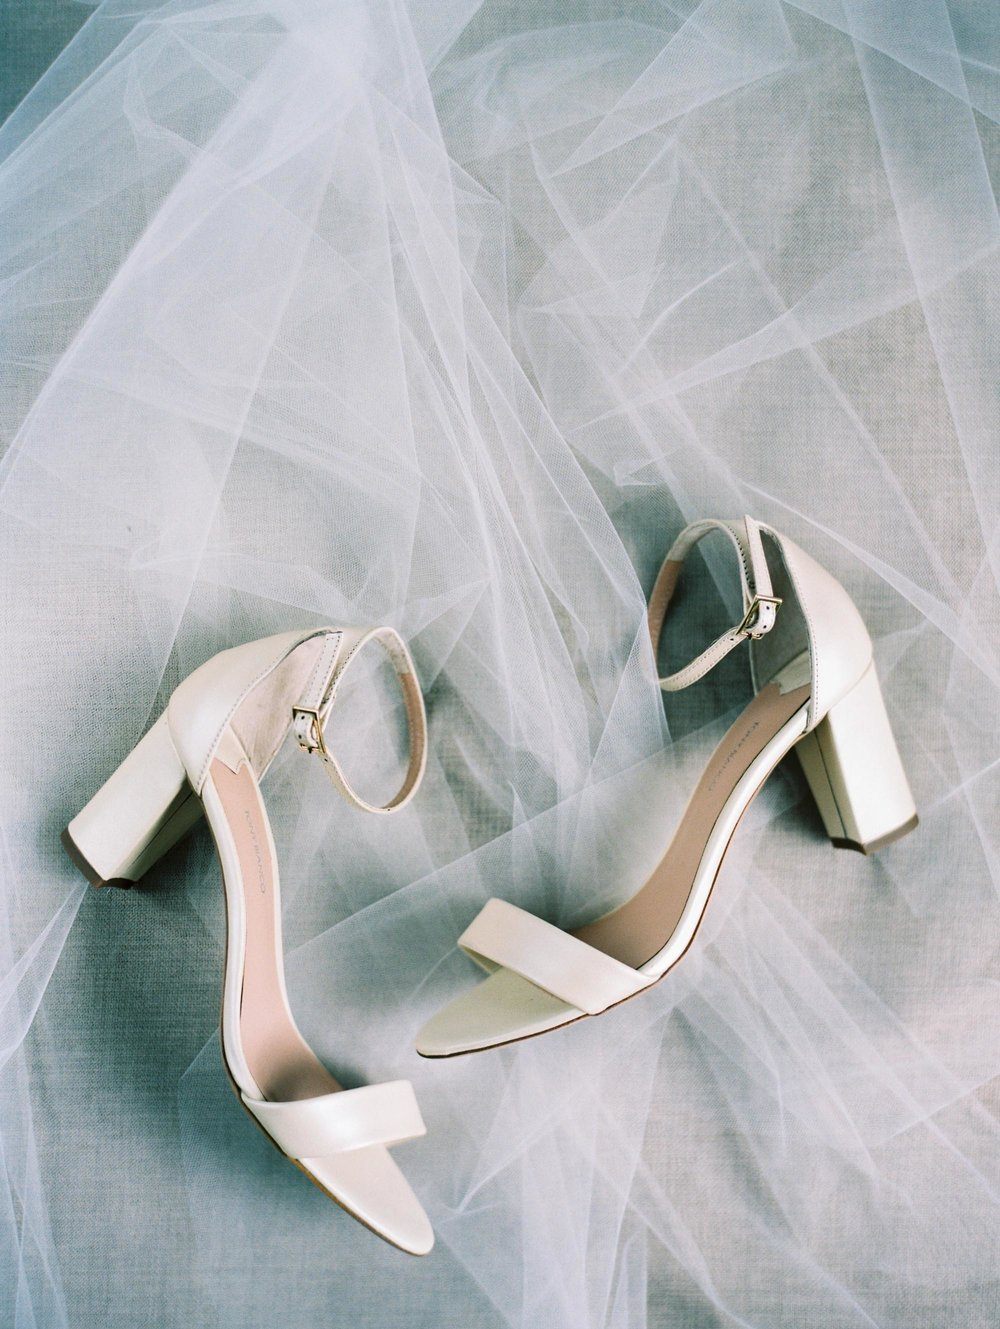 Golding-Wines-wedding-photography-020.jpg